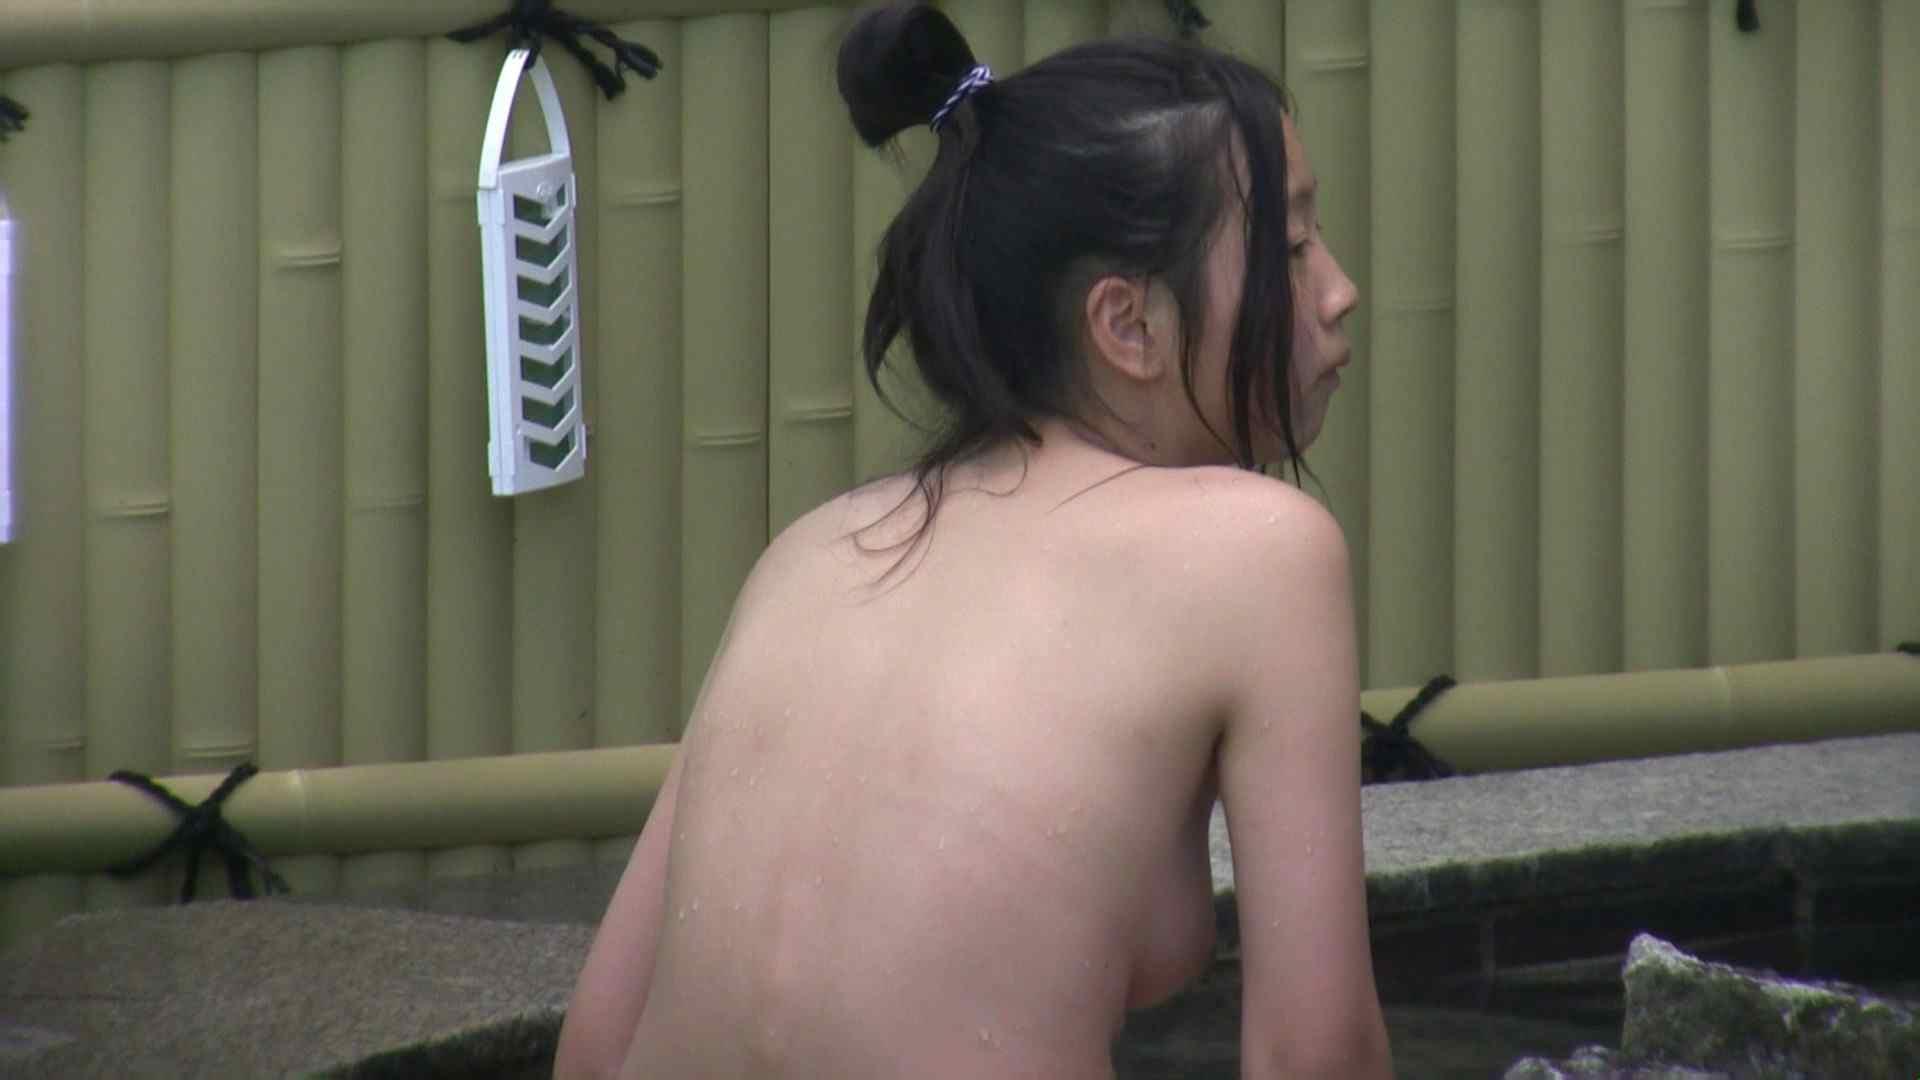 Aquaな露天風呂Vol.87【VIP限定】 0  15連発 10